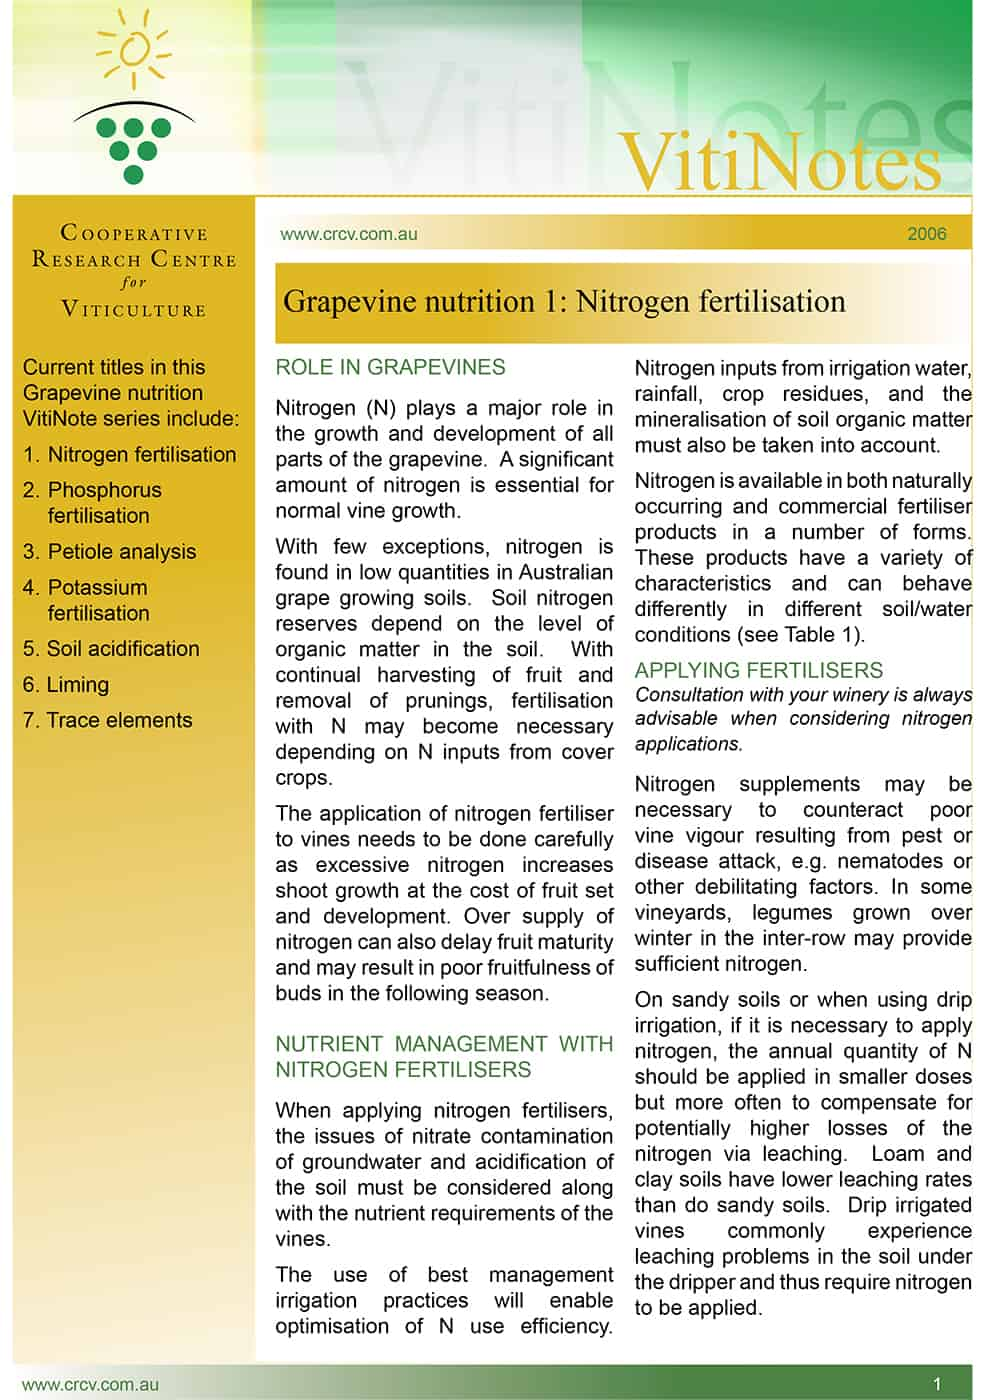 Grapevine nutrition 1: Nitrogen fertilisation